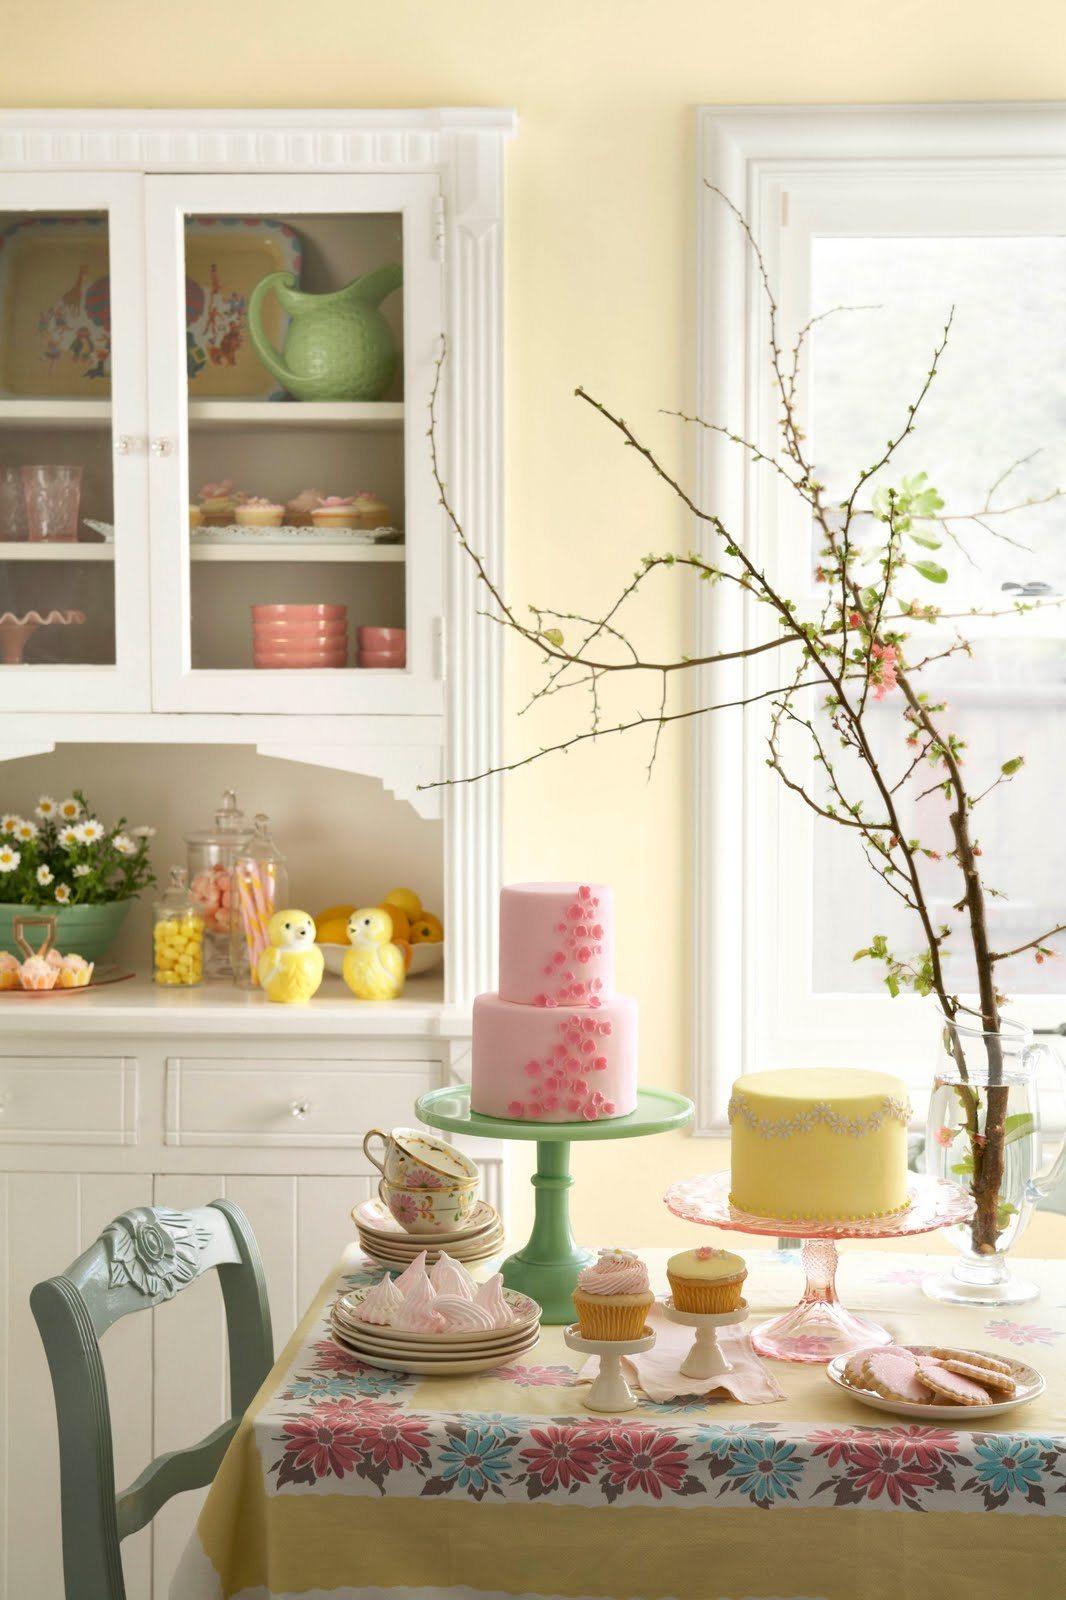 pinkyellowgreenbirthdaypartycountrydiningroom The